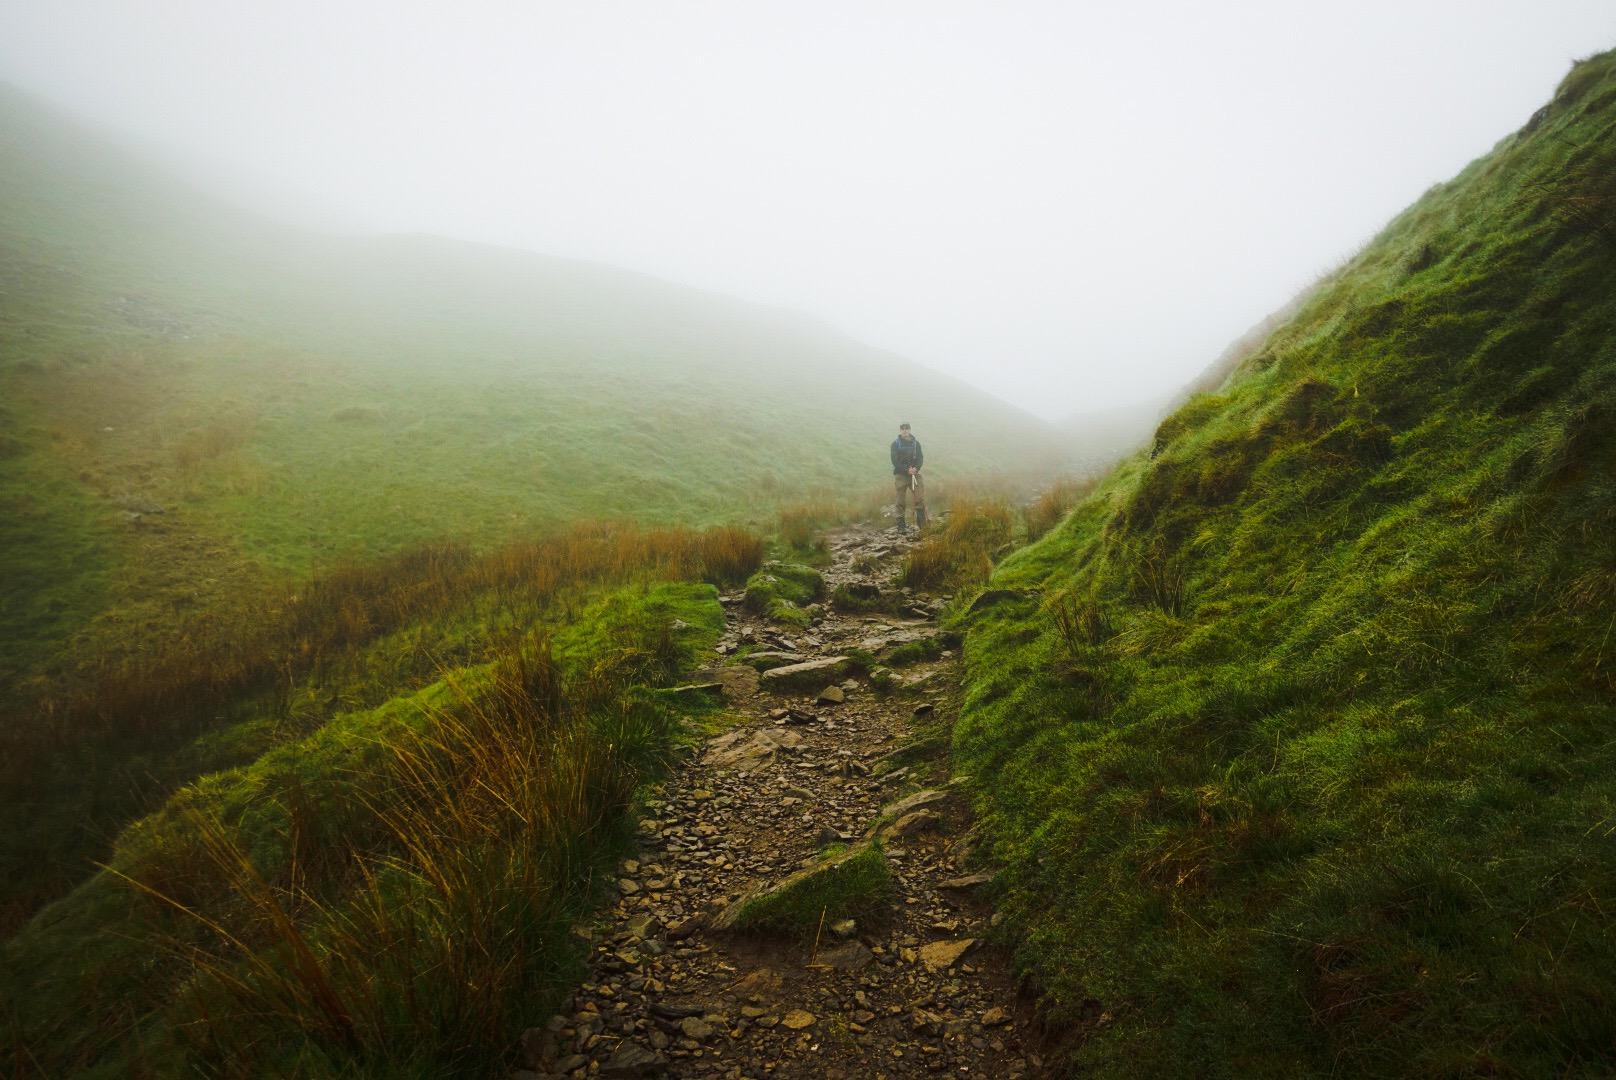 Climbing into the Mist